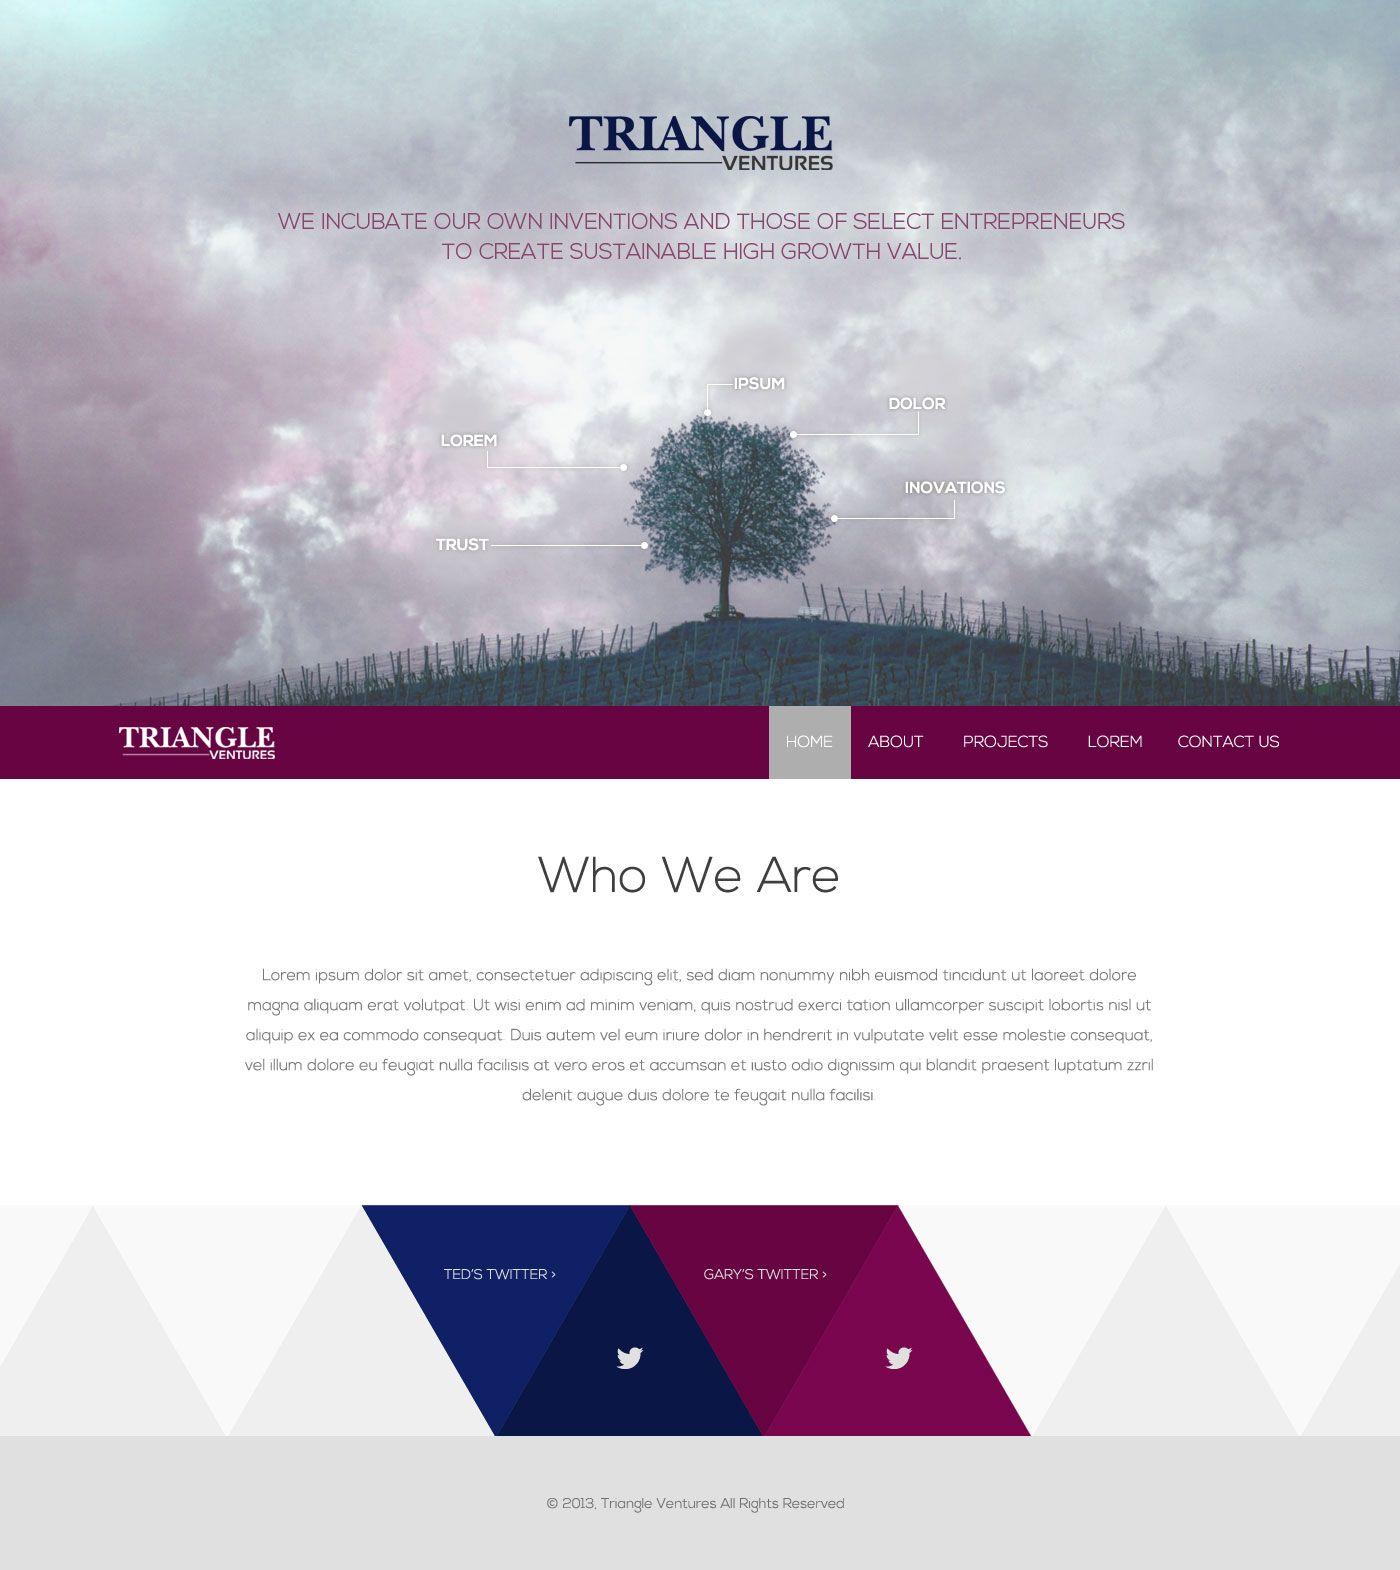 triangle-ventures2.jpg (1400×1570)